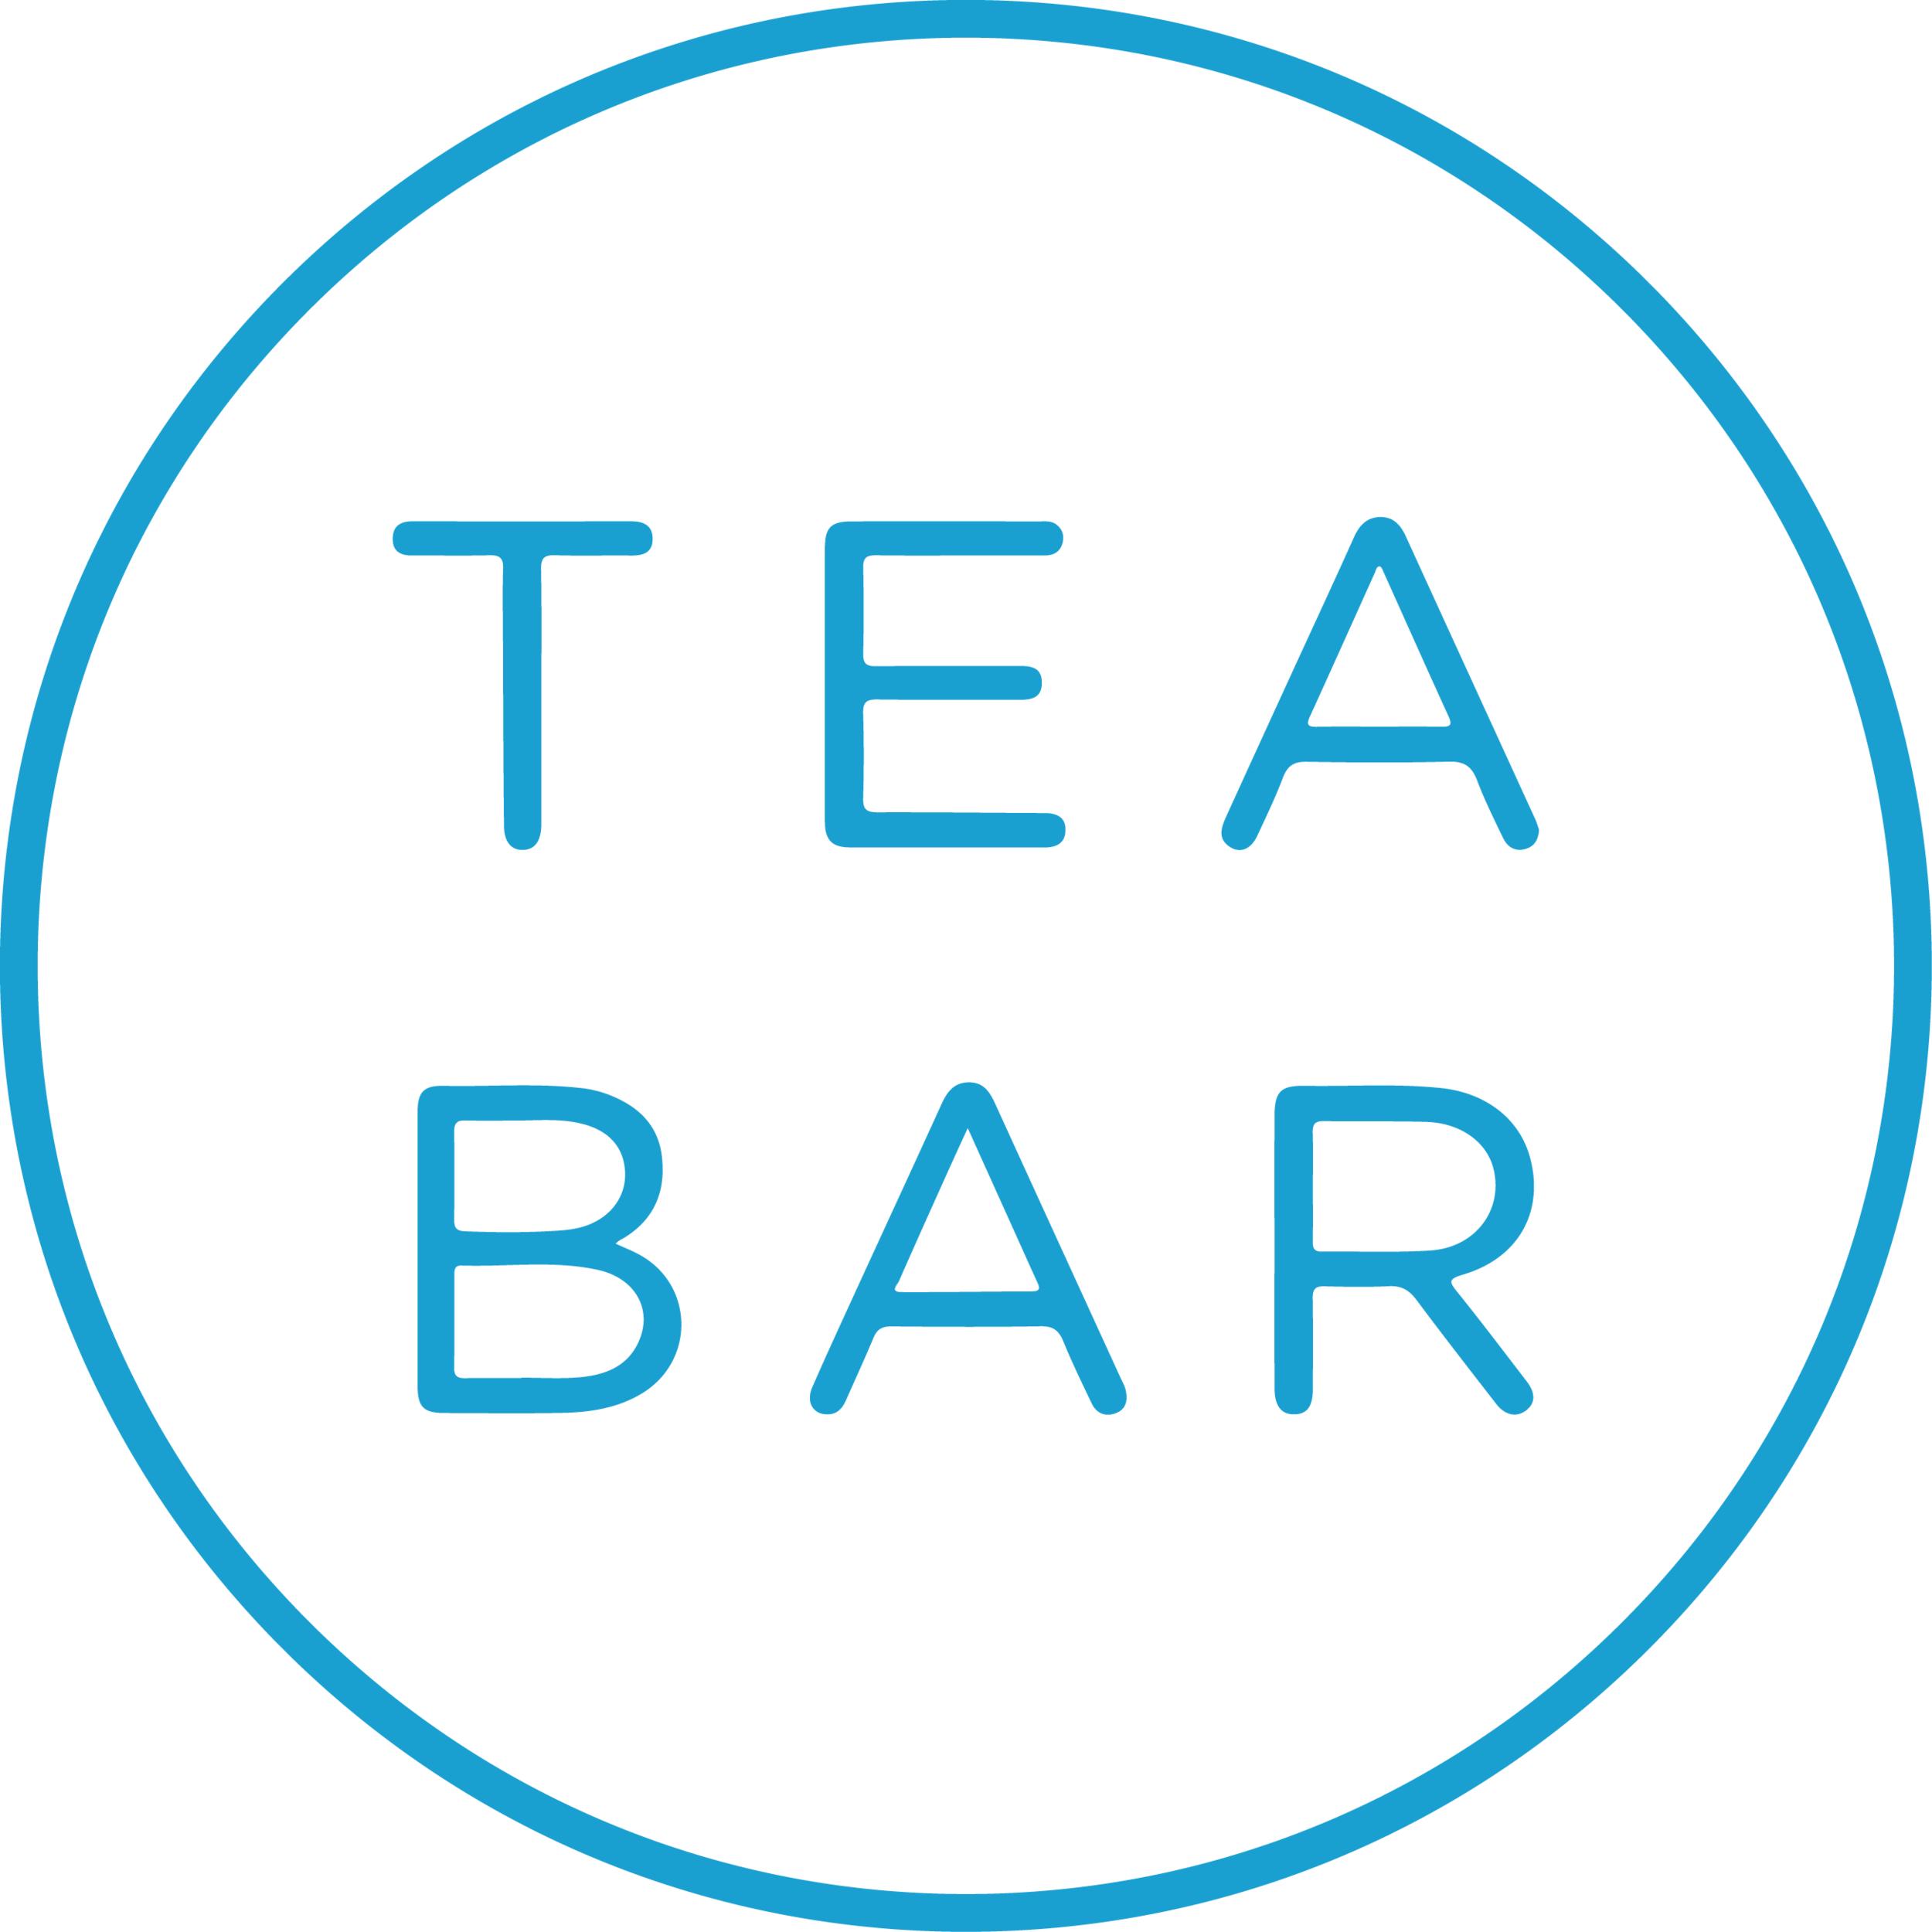 teabar_298c-blue_logo.png